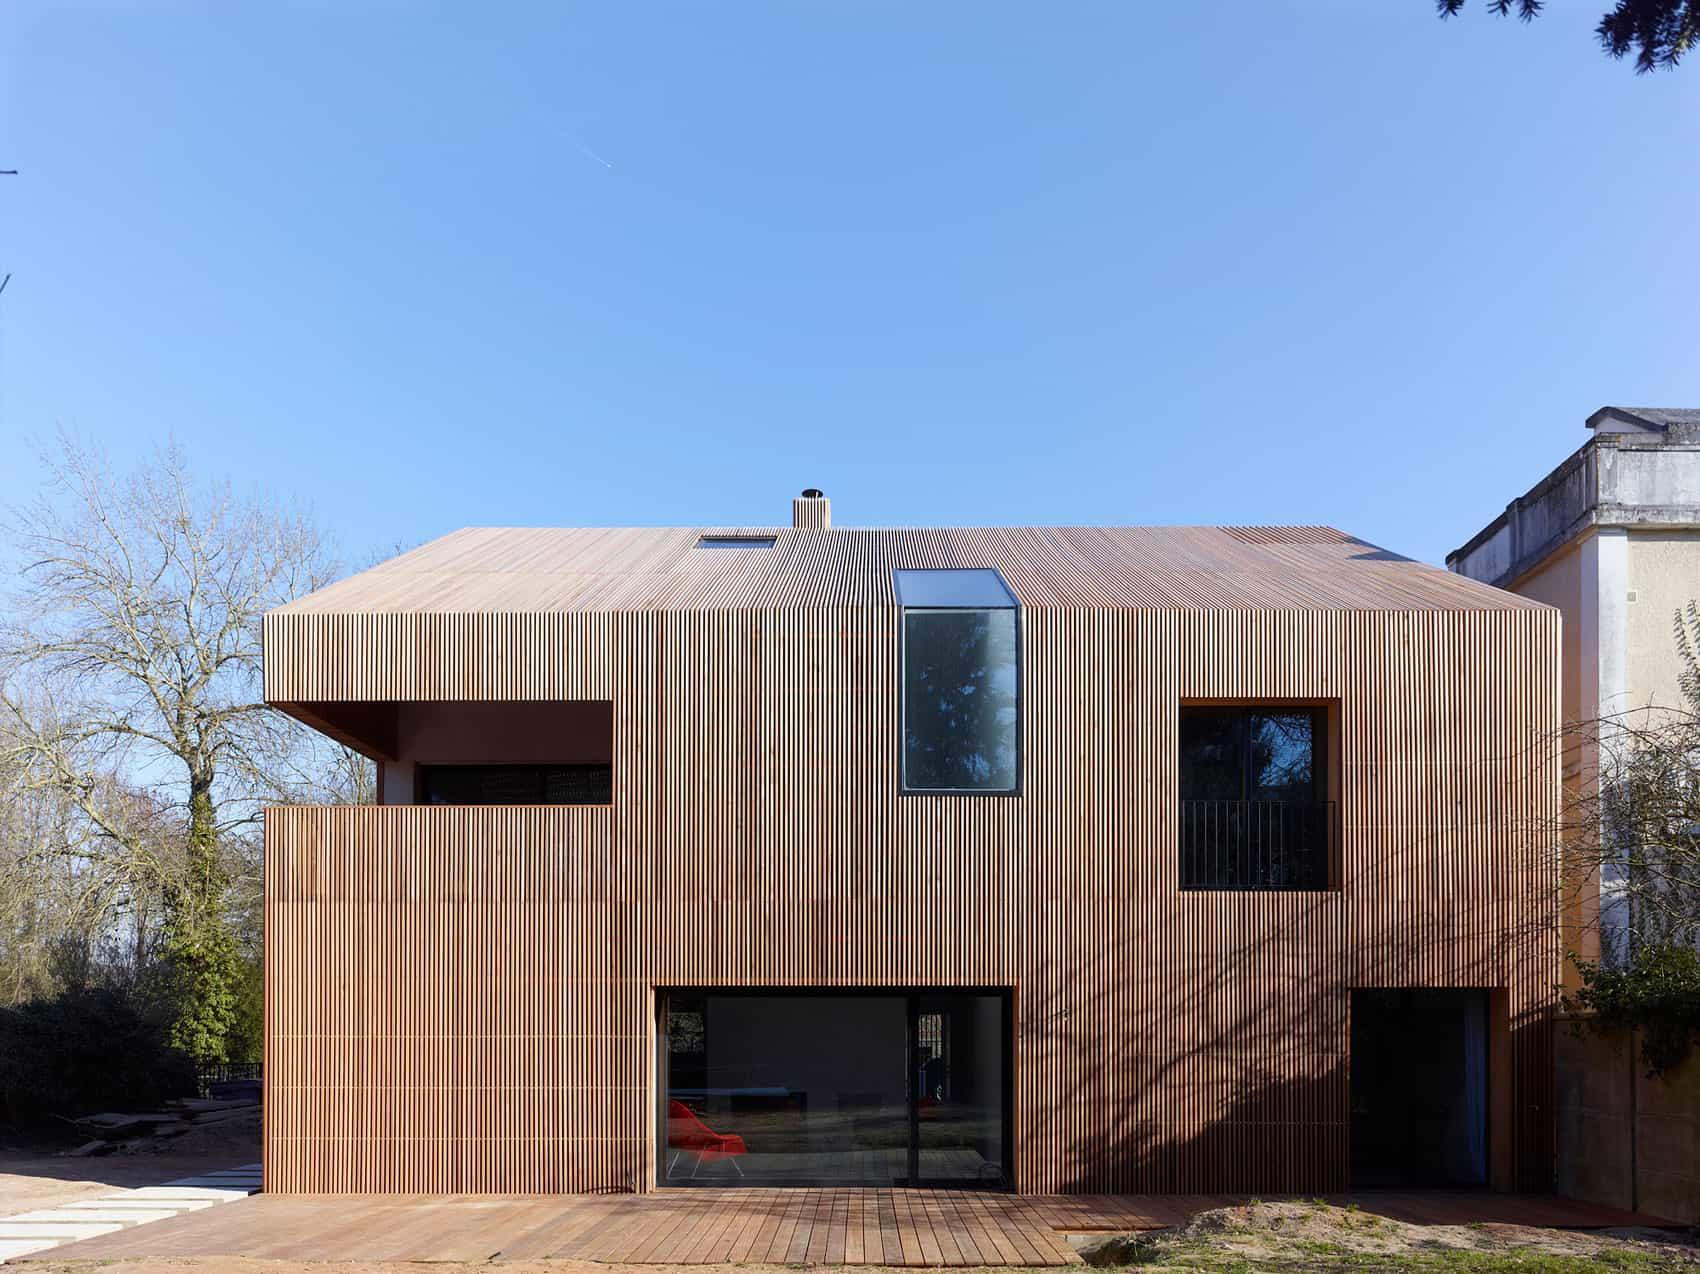 Maison 2G by Avenier Cornejo Architectes (4)